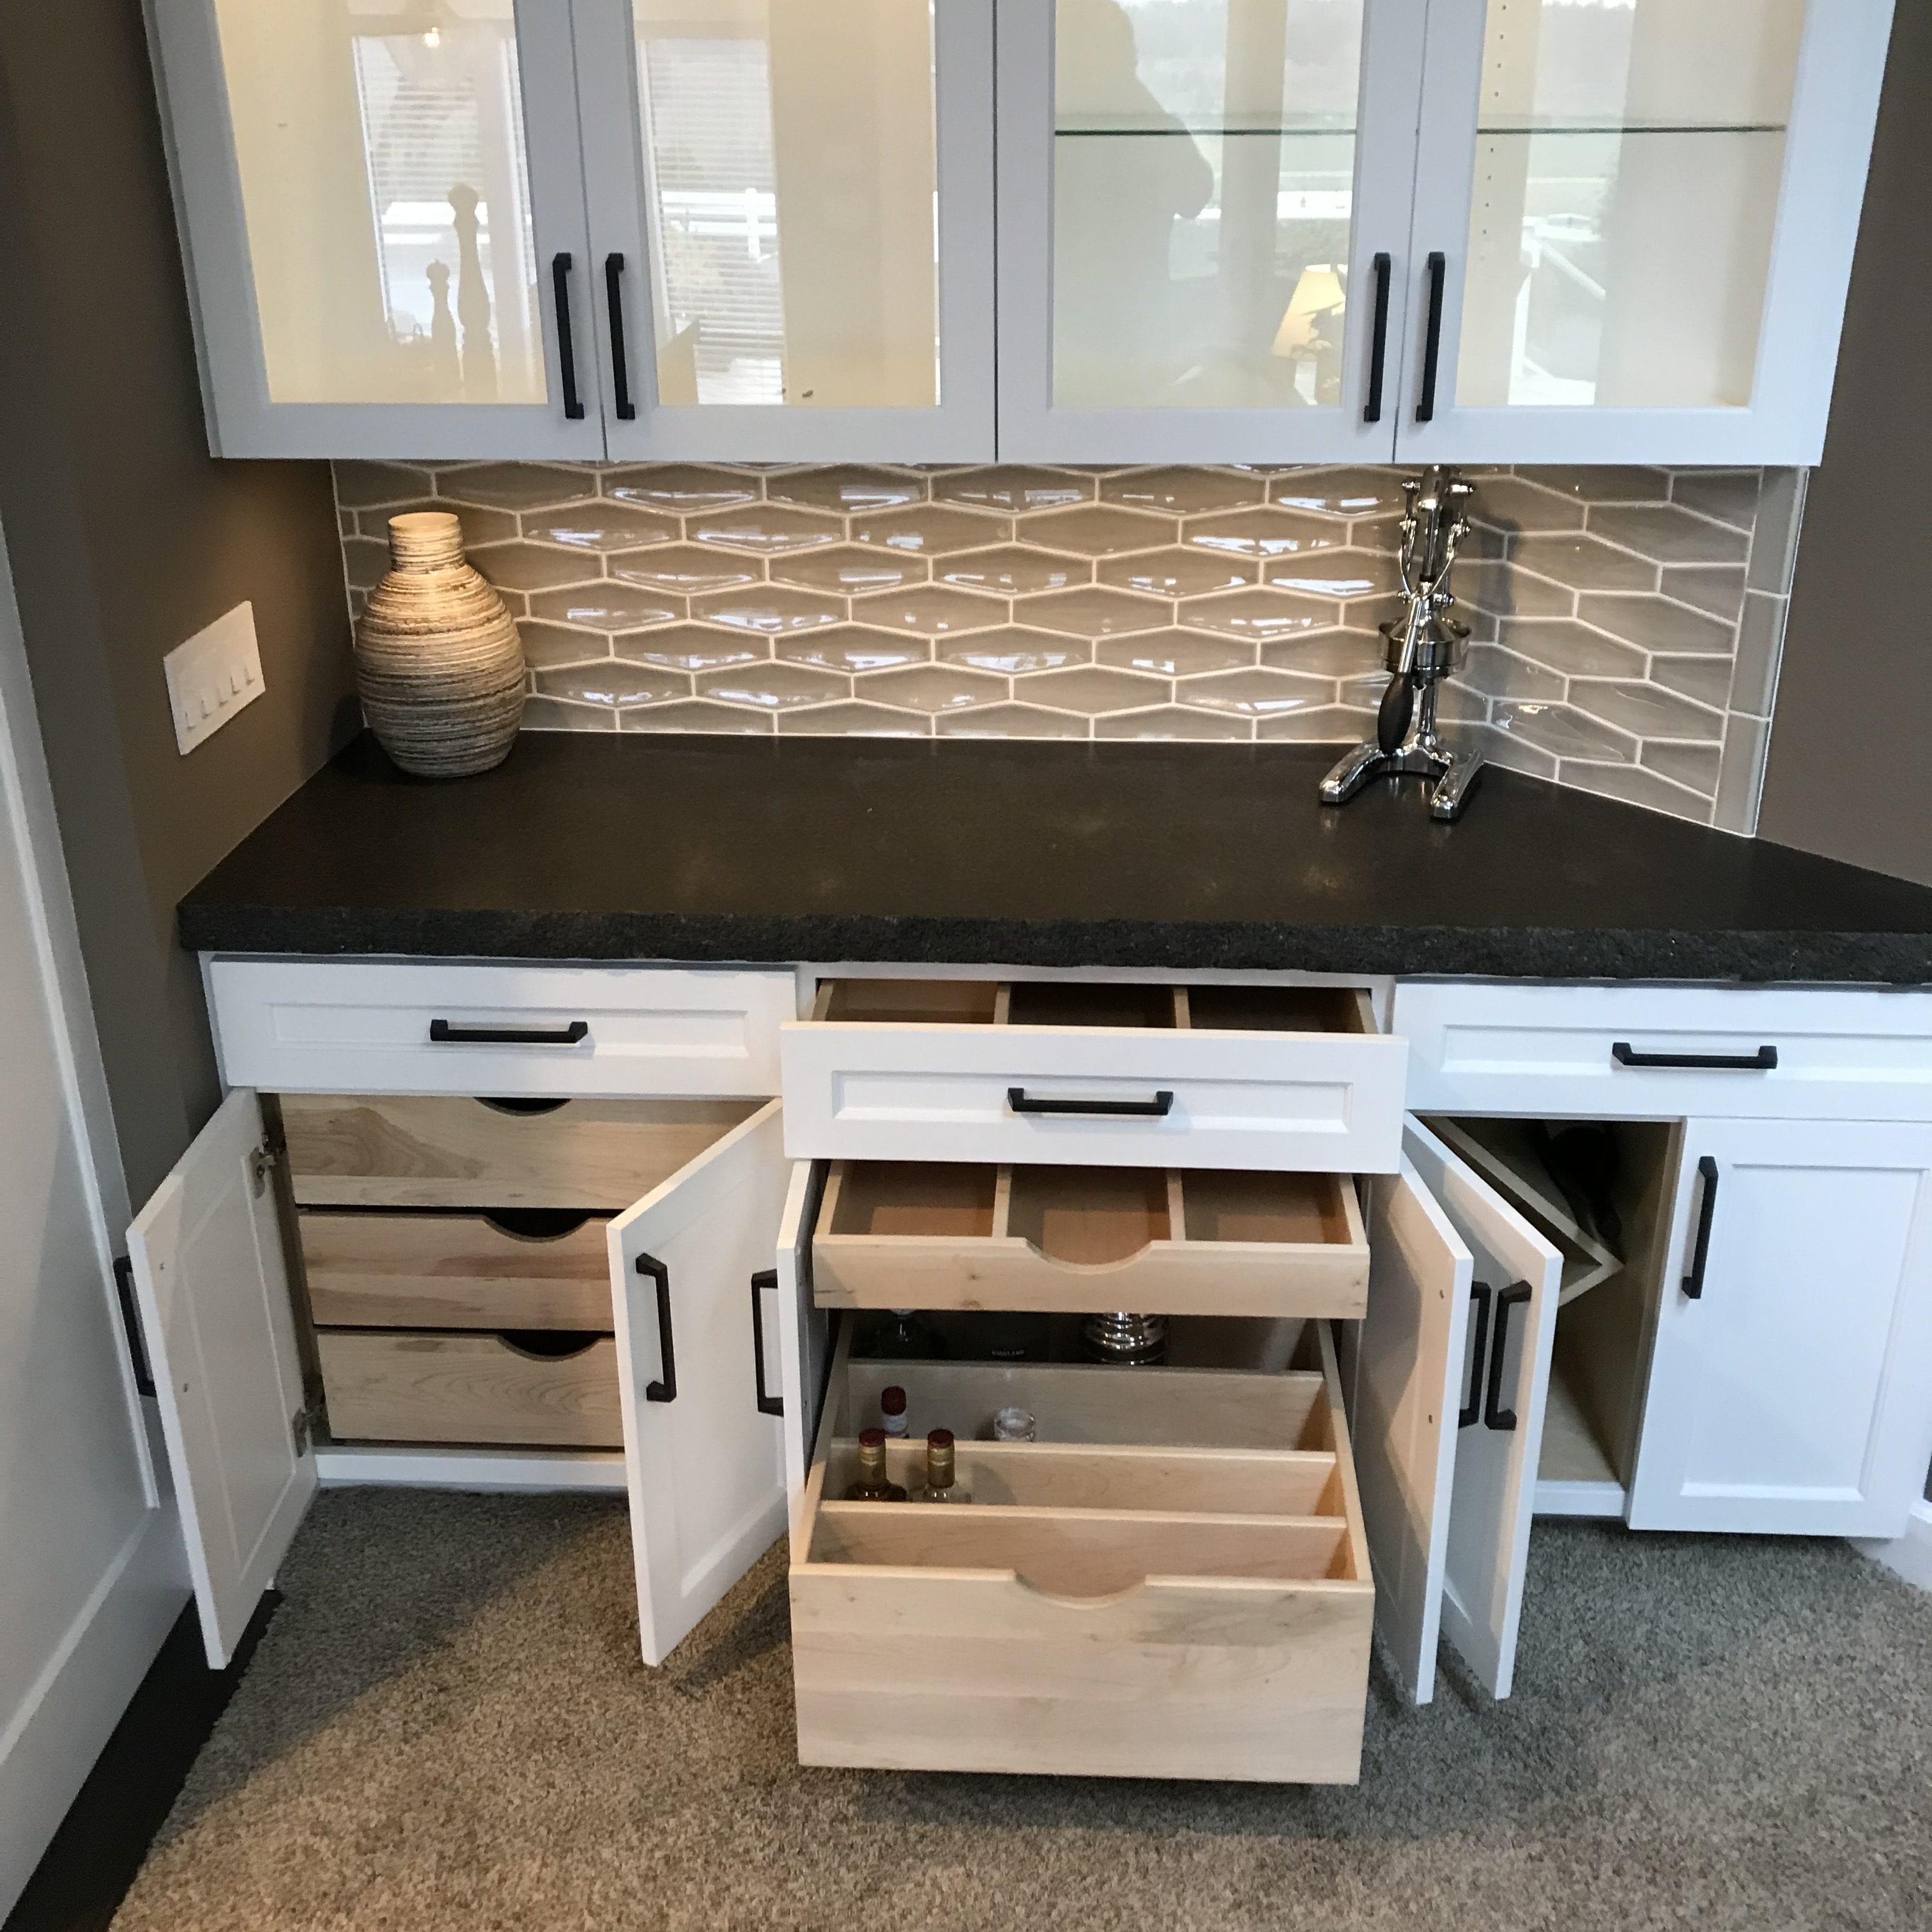 Efficient Awesome Dry Bar Storage Ideas Kashas Design Build